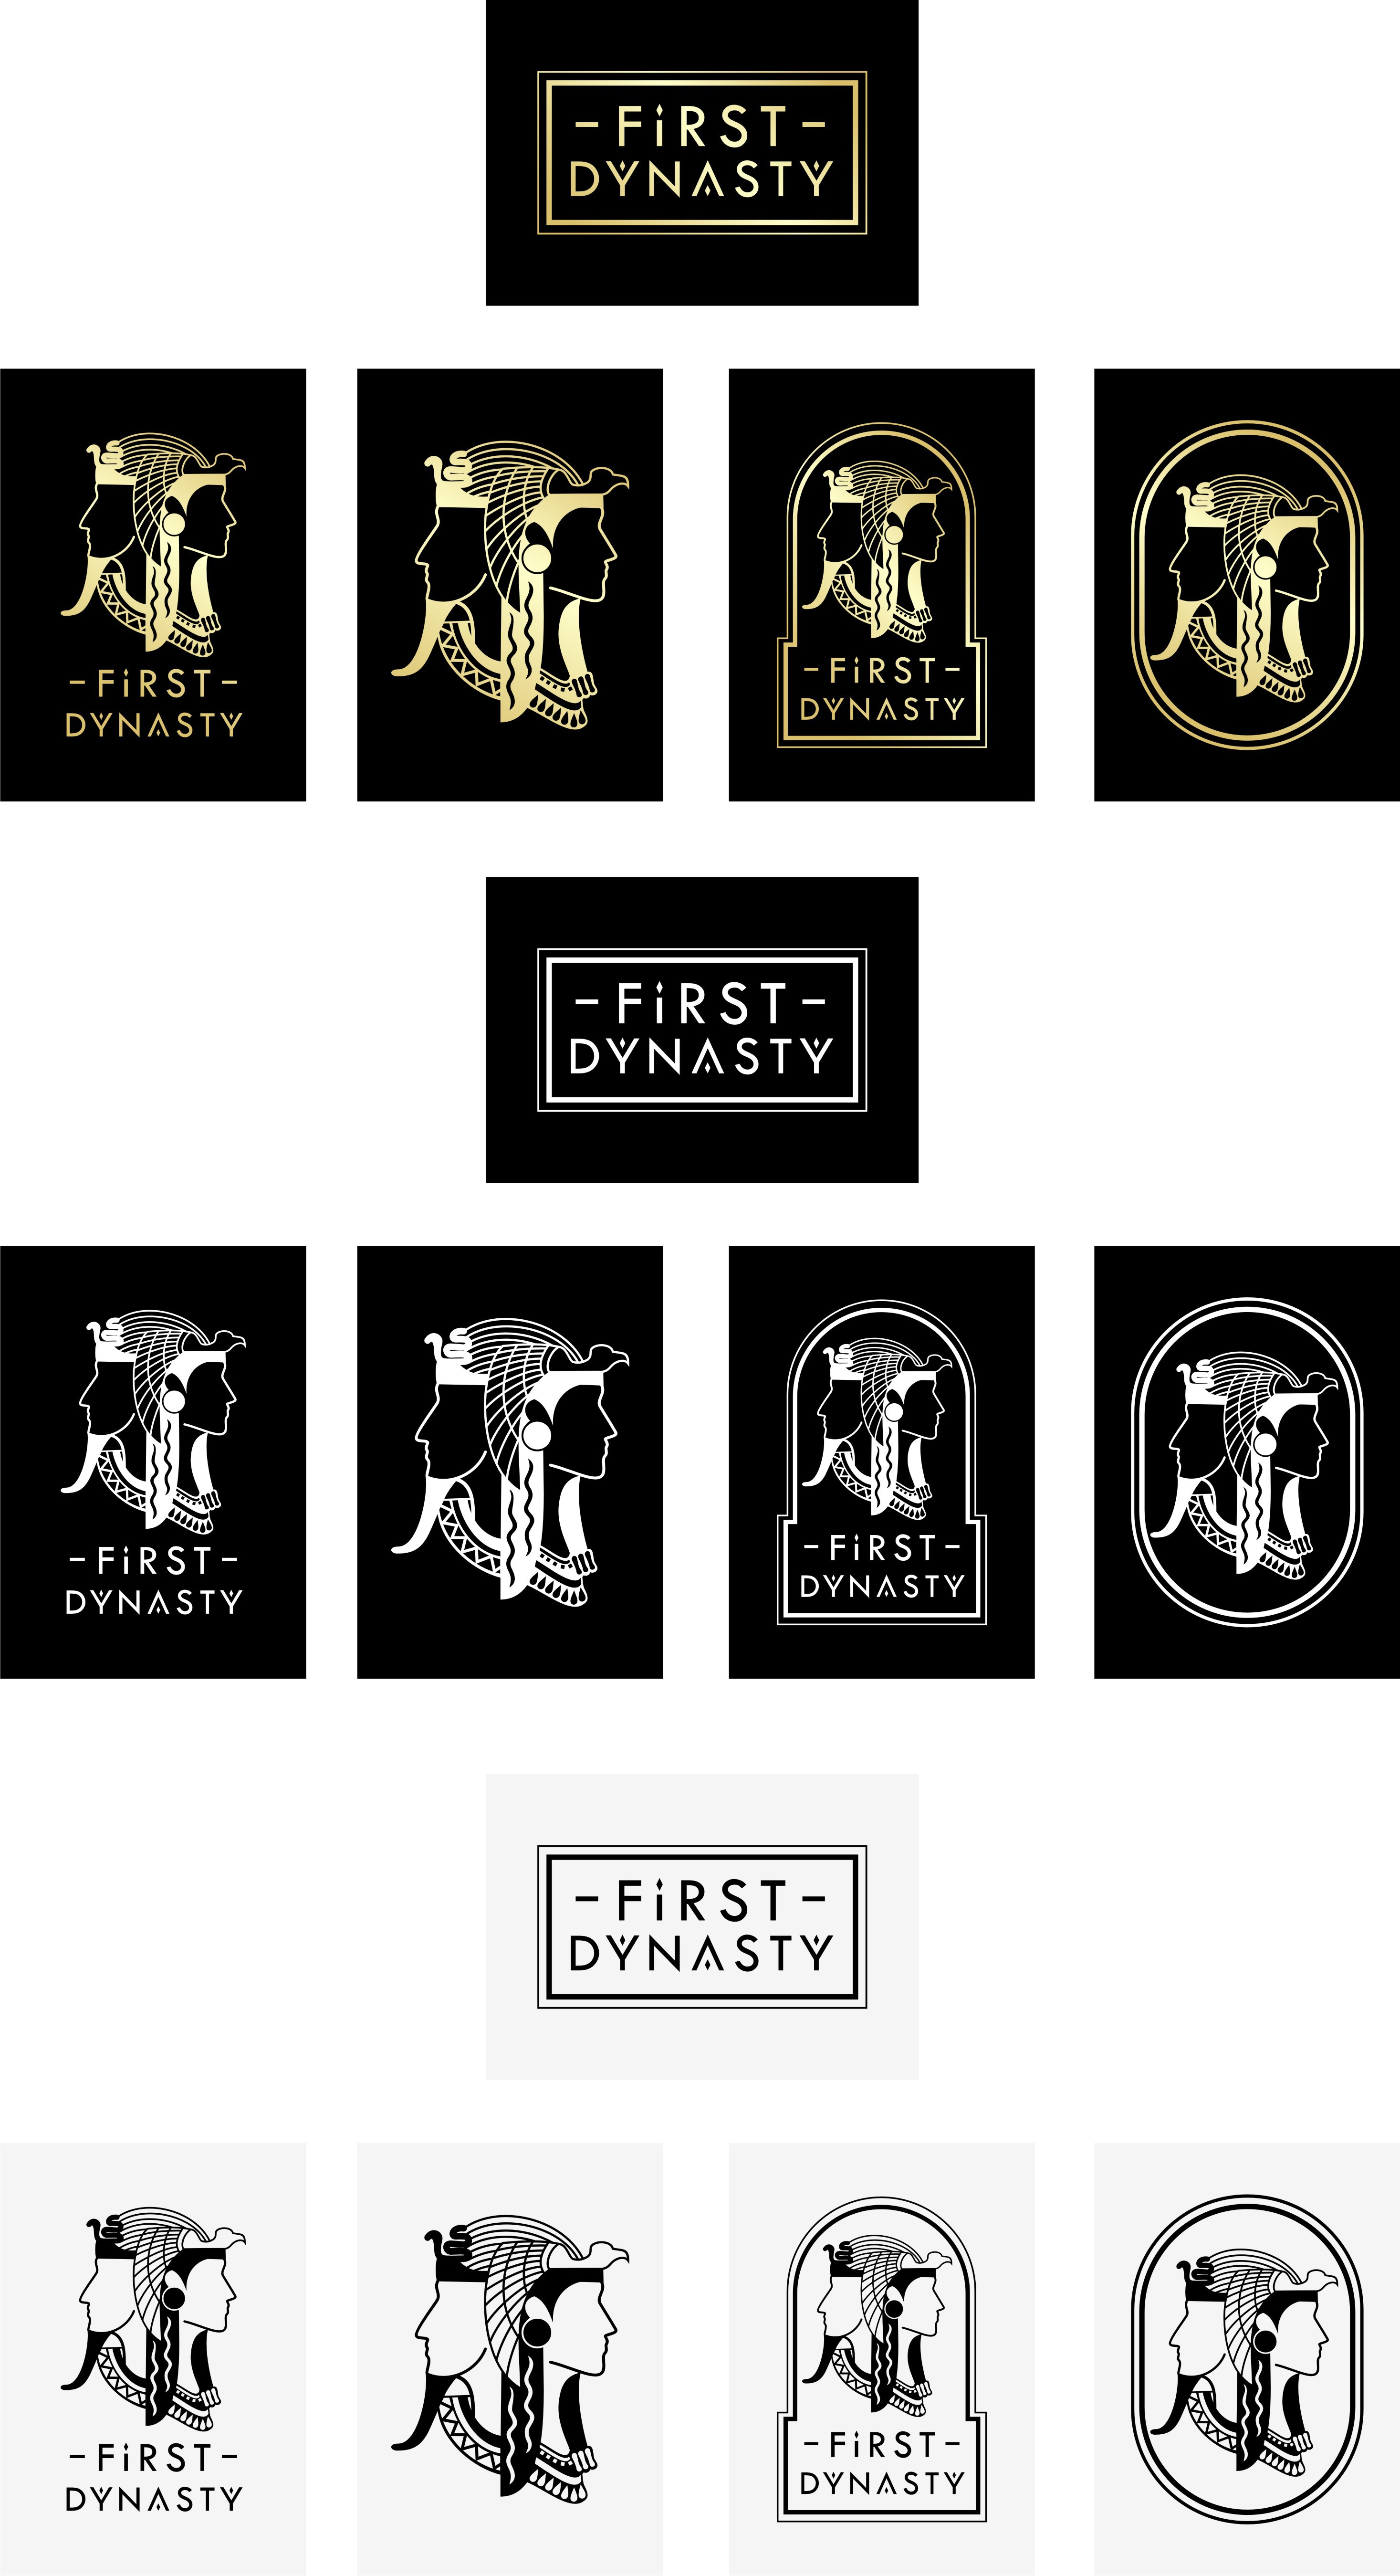 FIRST DYNASTY APPAREL needs a POWERFUL Egyptian concept LOGO DESIGN